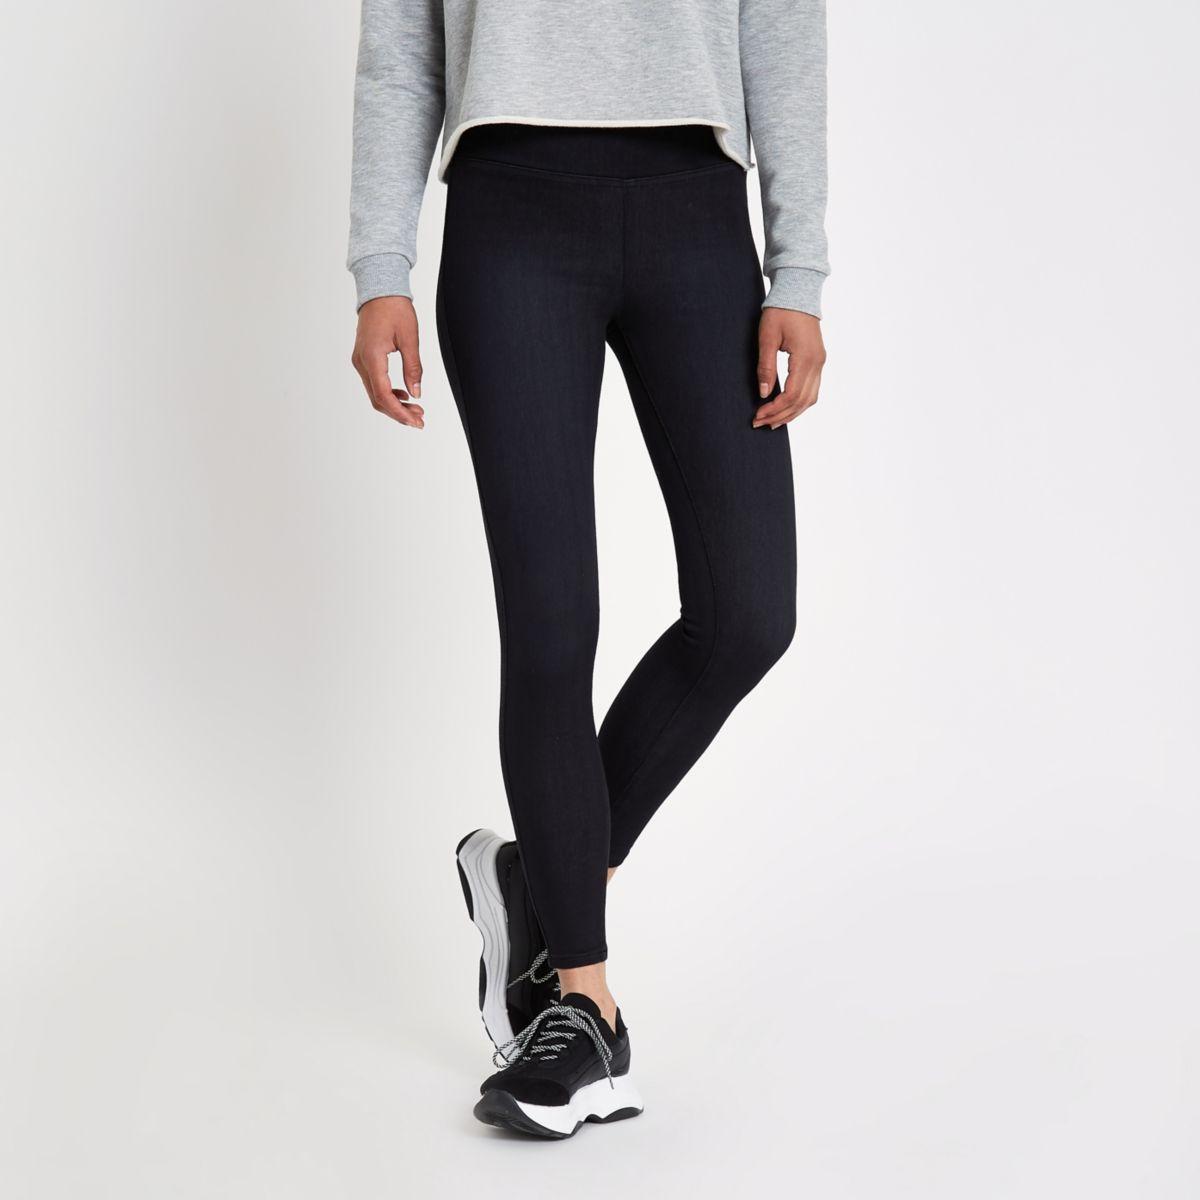 Zwarte denim legging met hoge taille